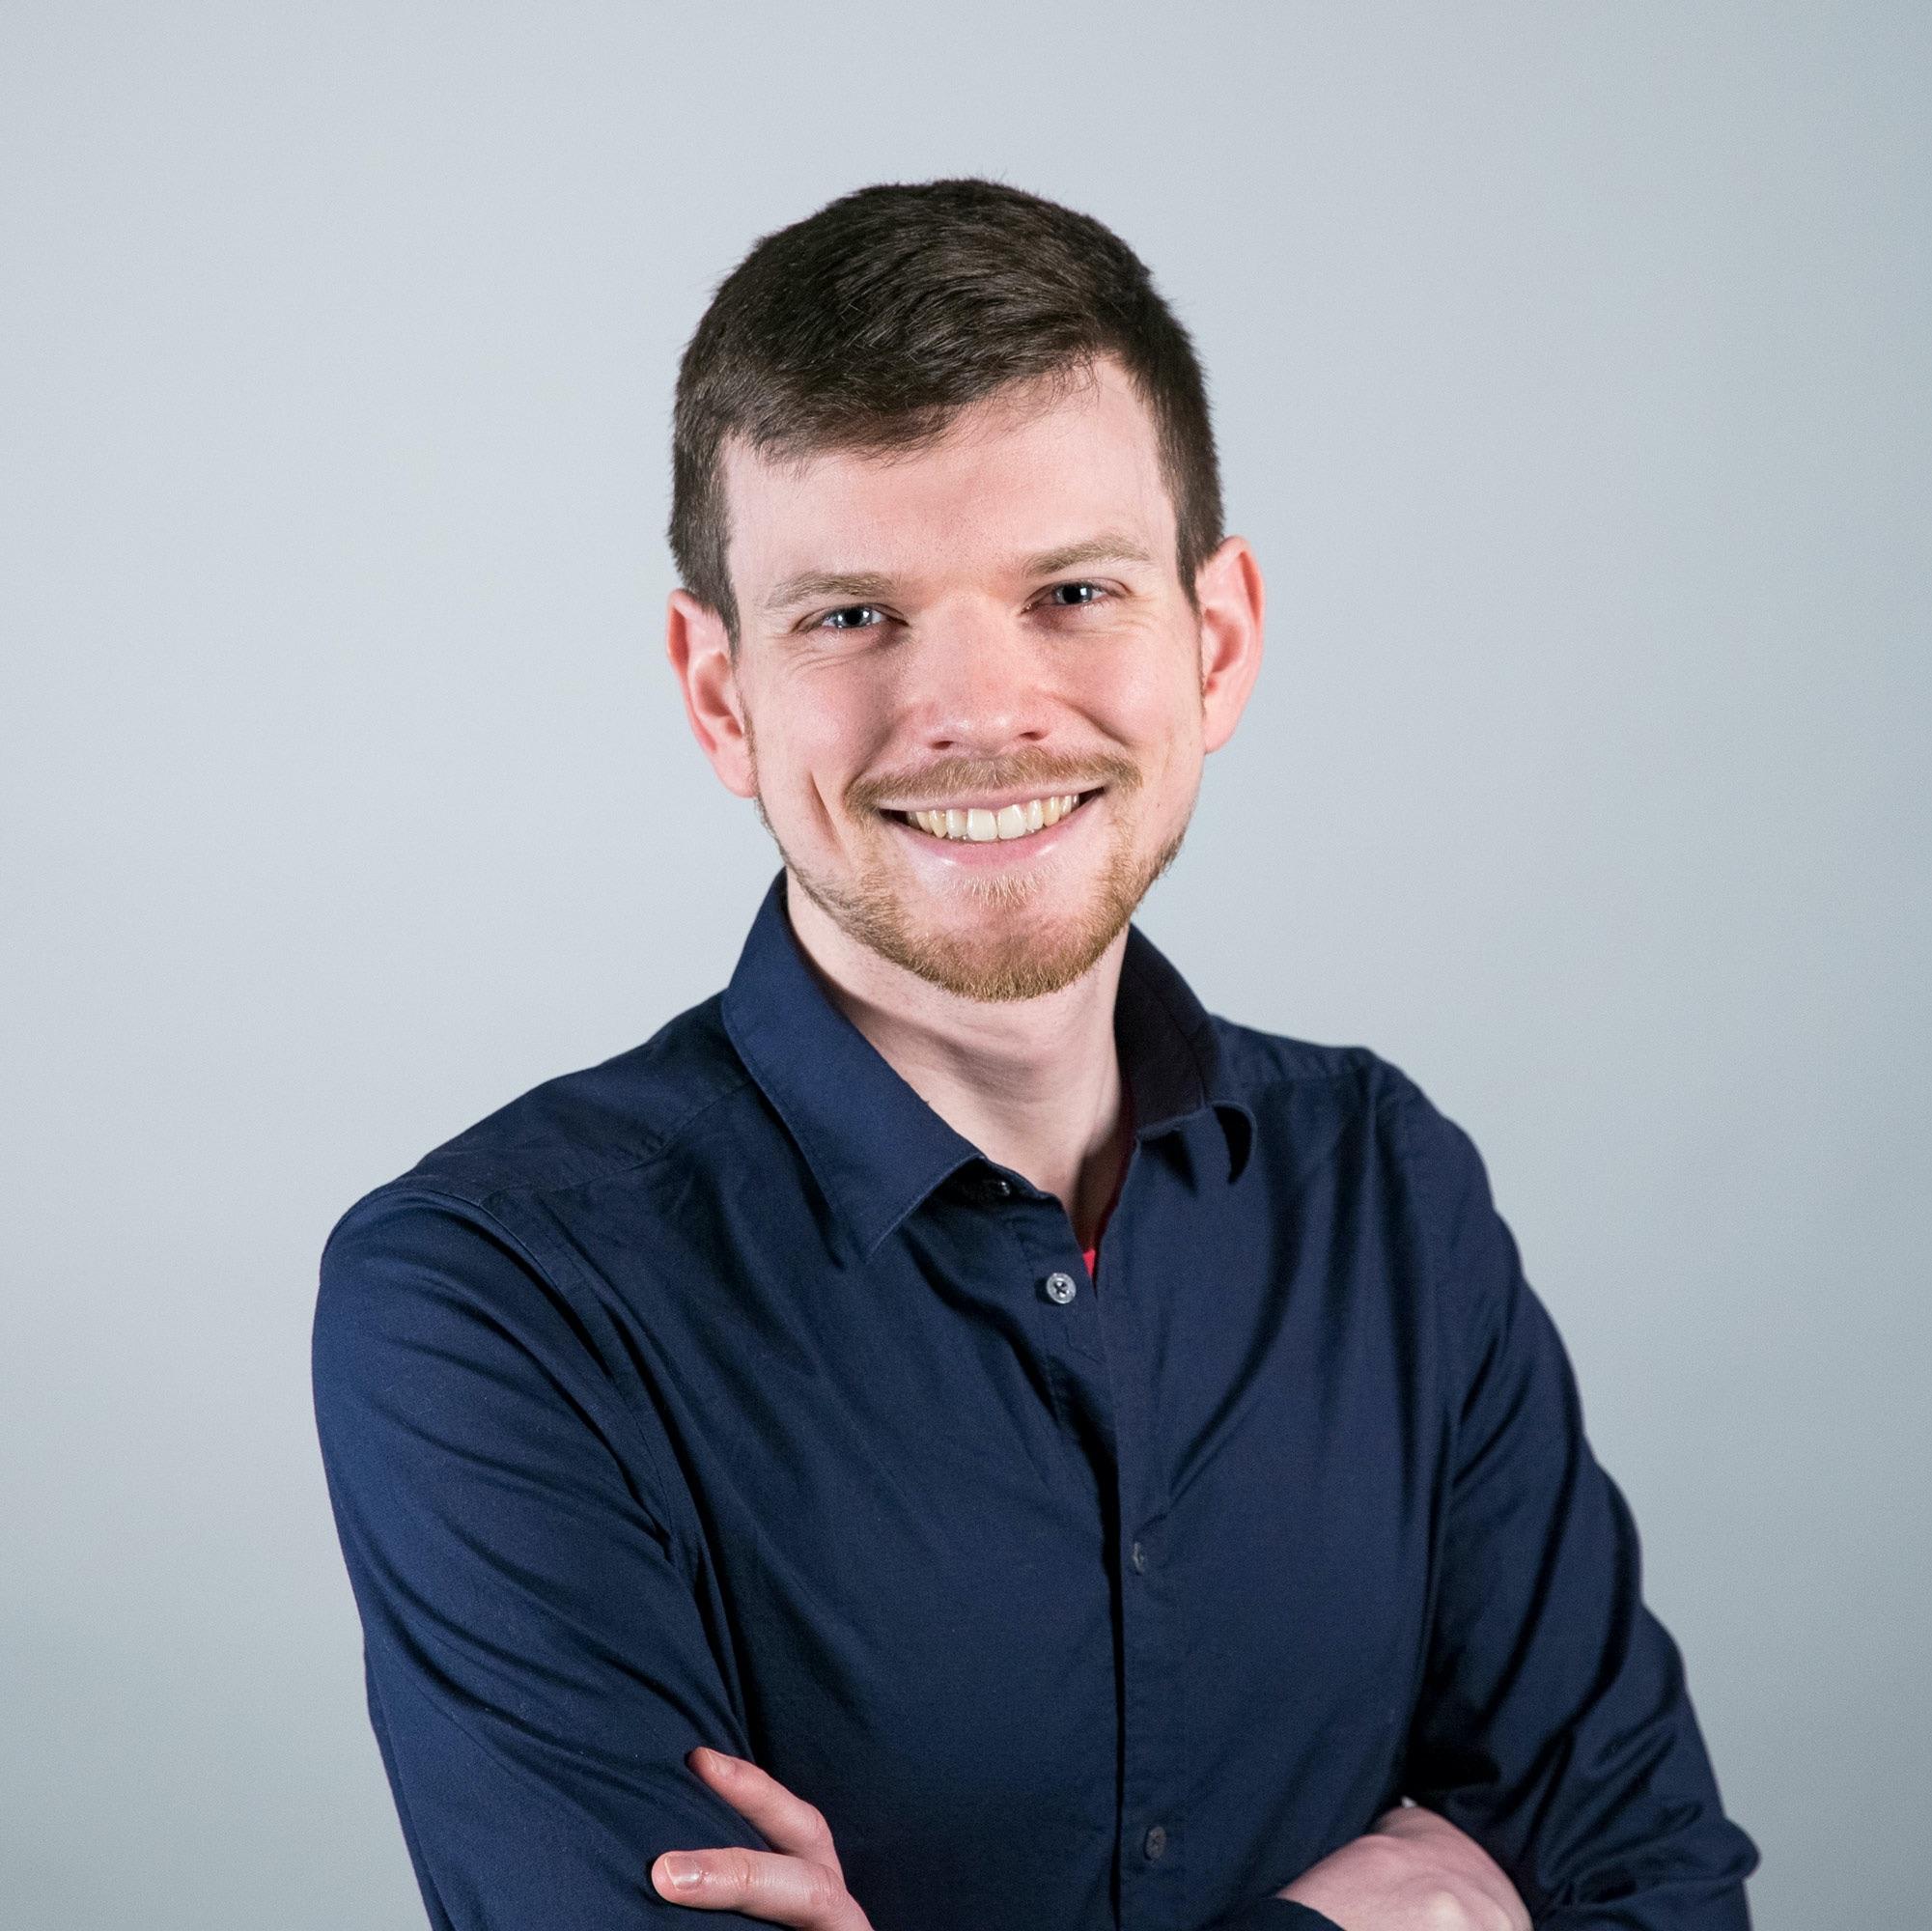 John Hacker Noon profile picture